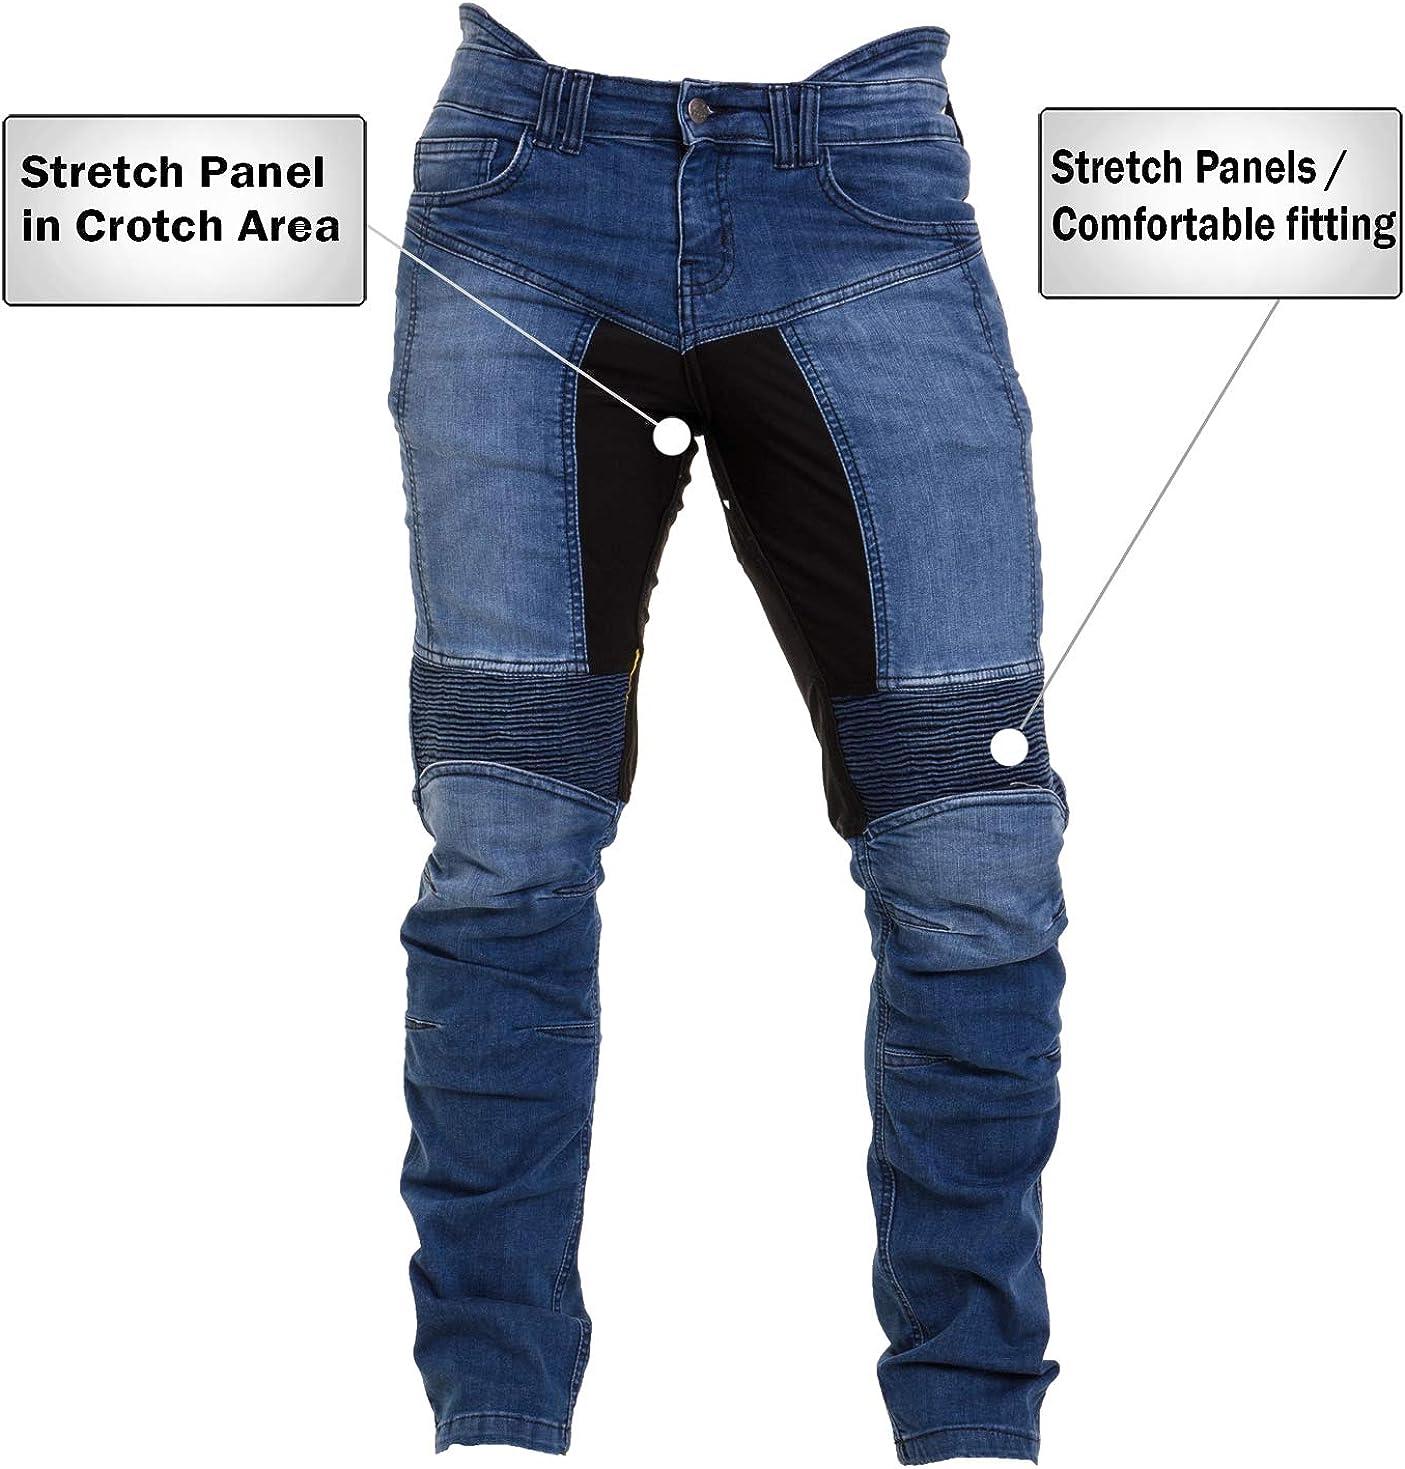 Qaswa Herren Motorradhose Jeans Motorrad Hose Motorradr/üstung Schutzauskleidung Motorcycle Biker Pants